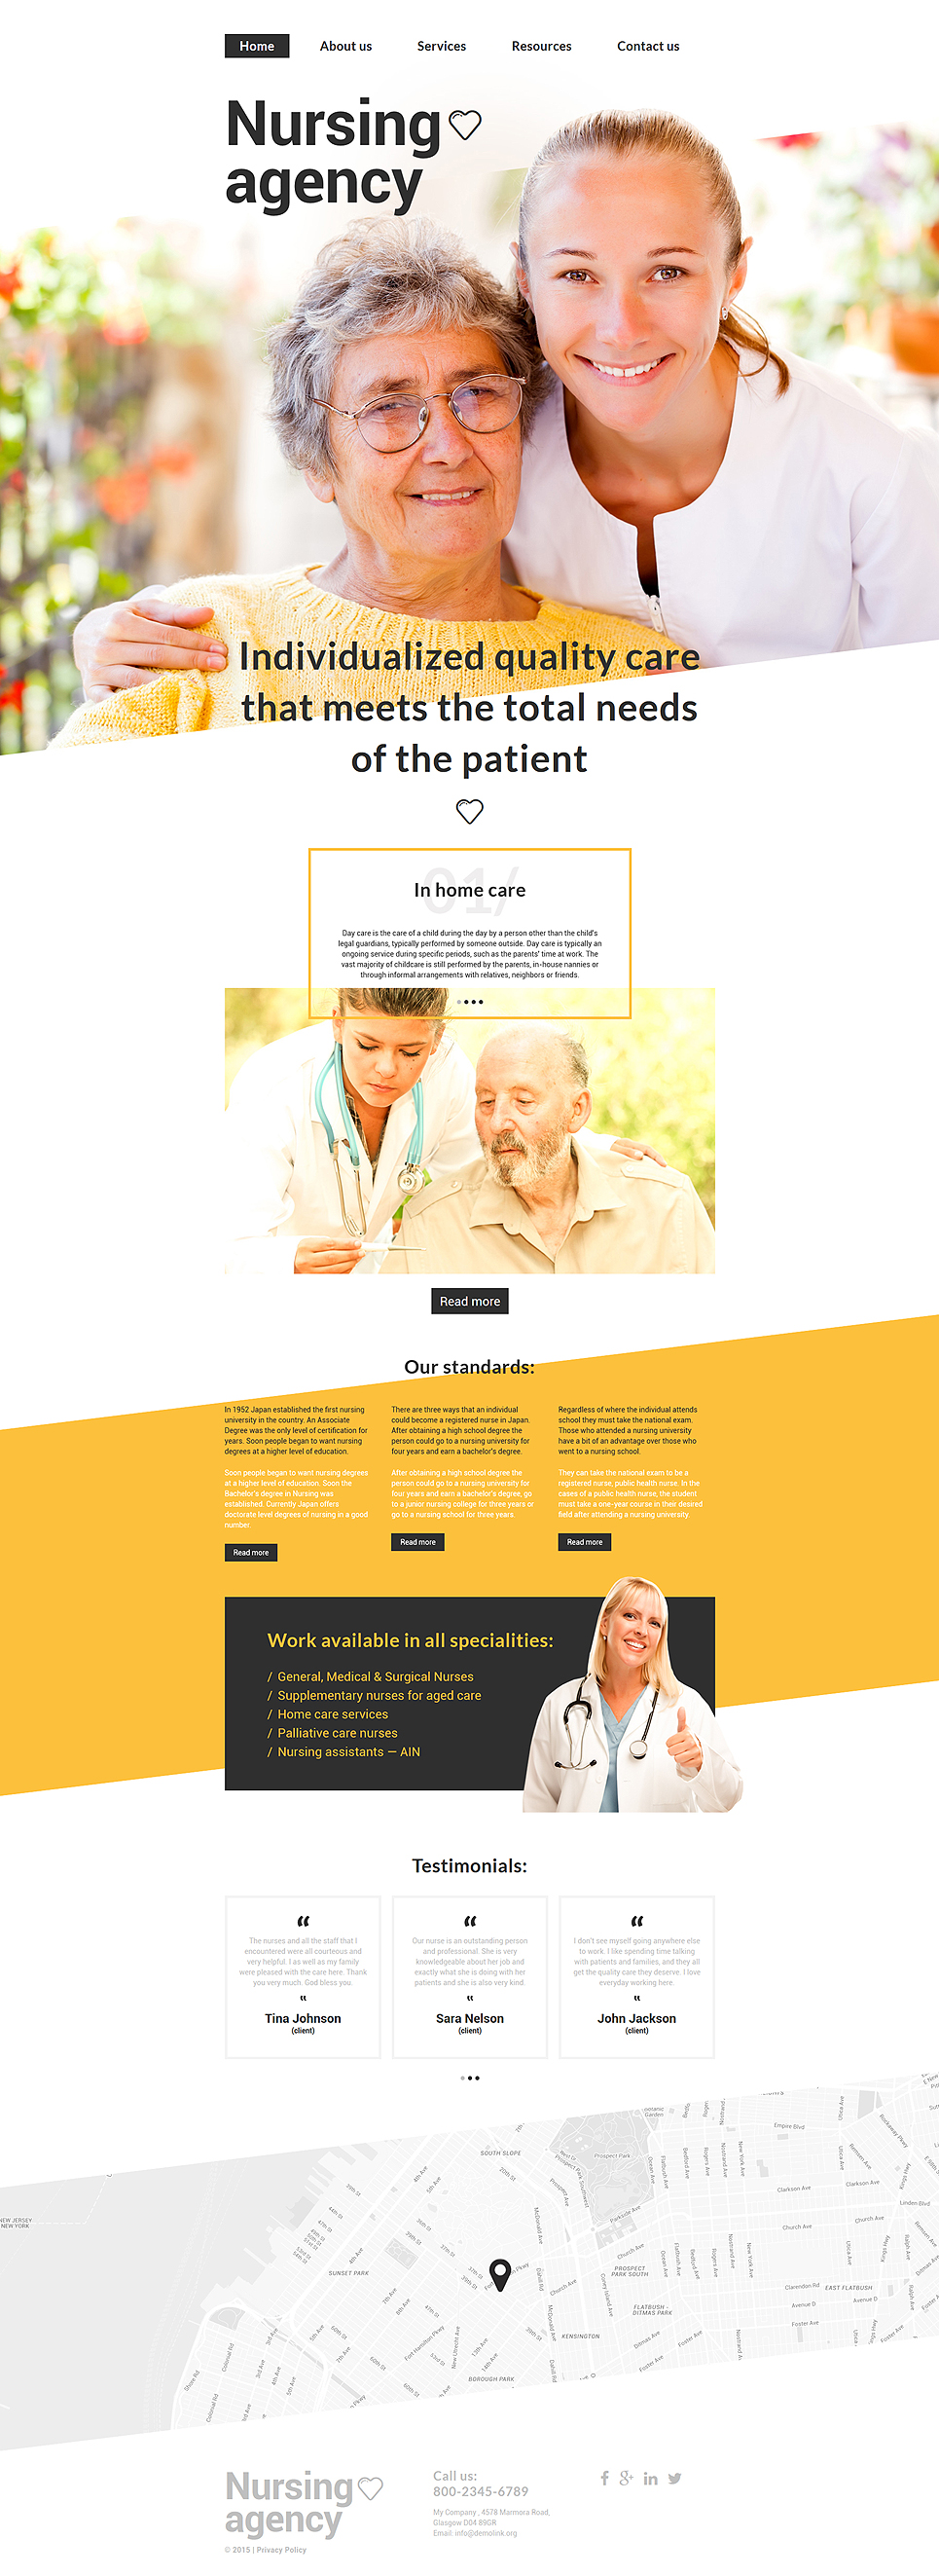 Nursing Agency template illustration image